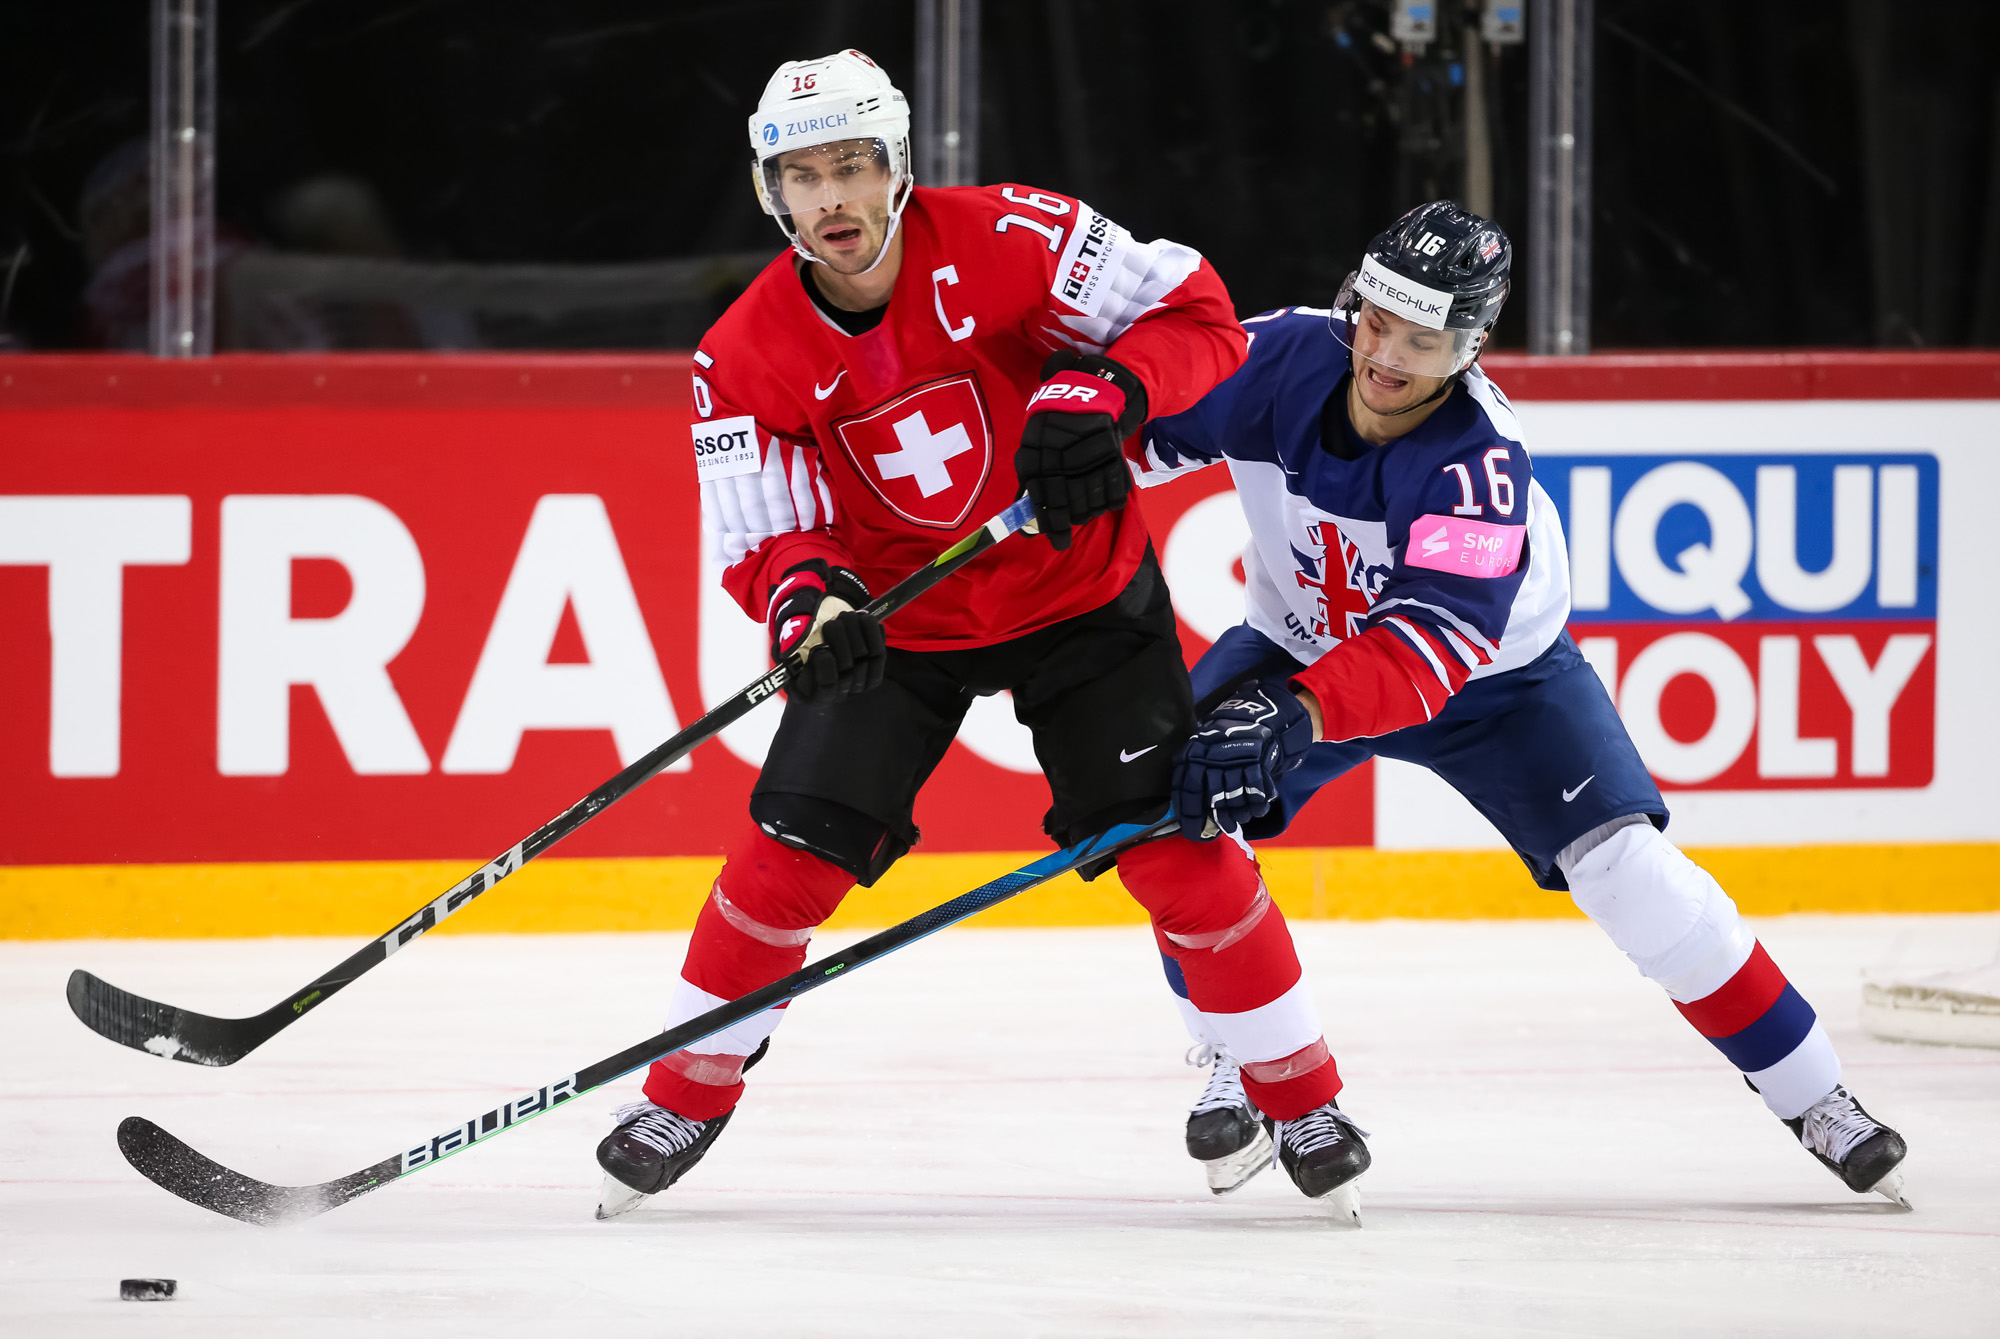 Ice Hockey Wm 2021